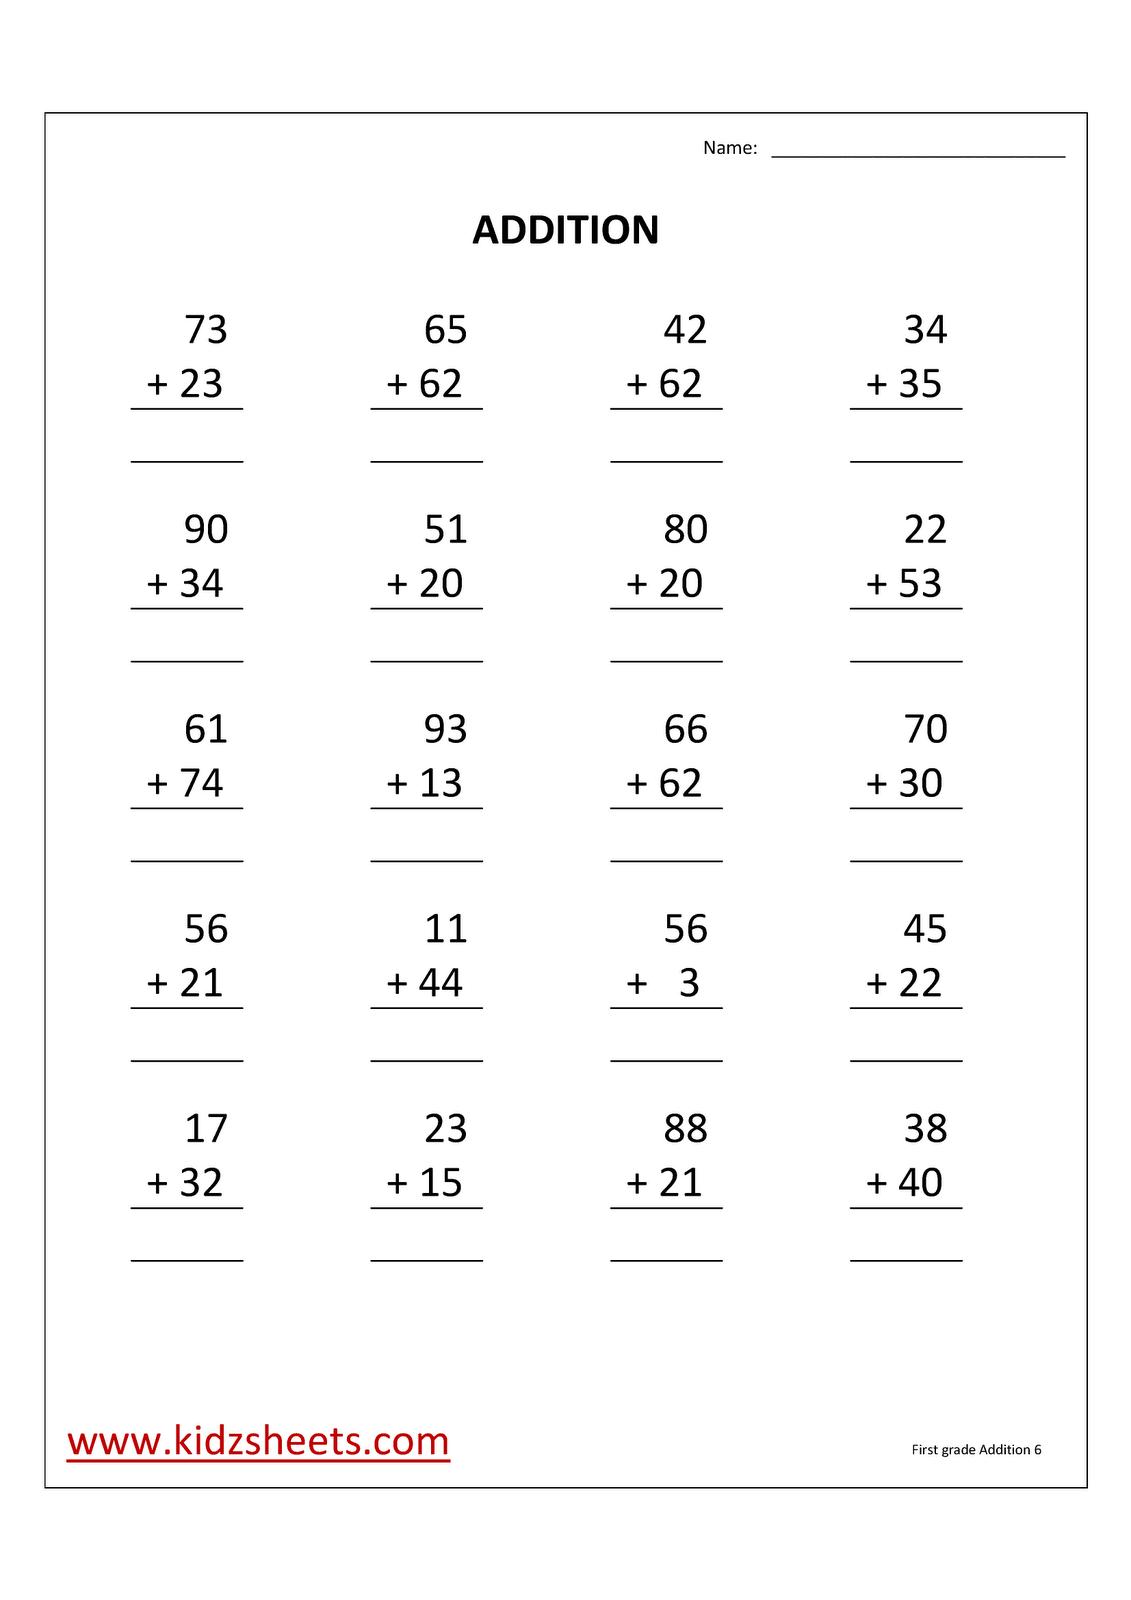 Kidz Worksheets First Grade Addition Worksheet6